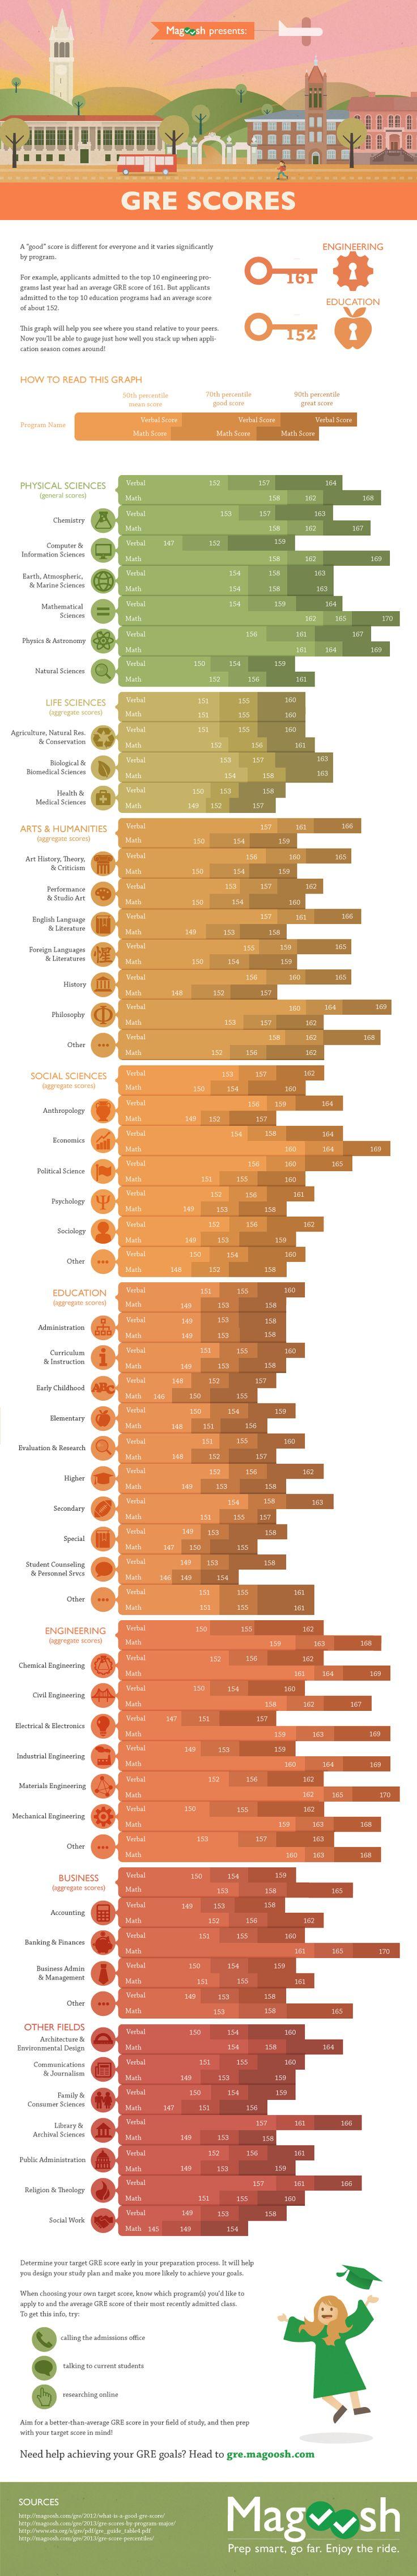 Average, Good, & Great GRE Scores for each program